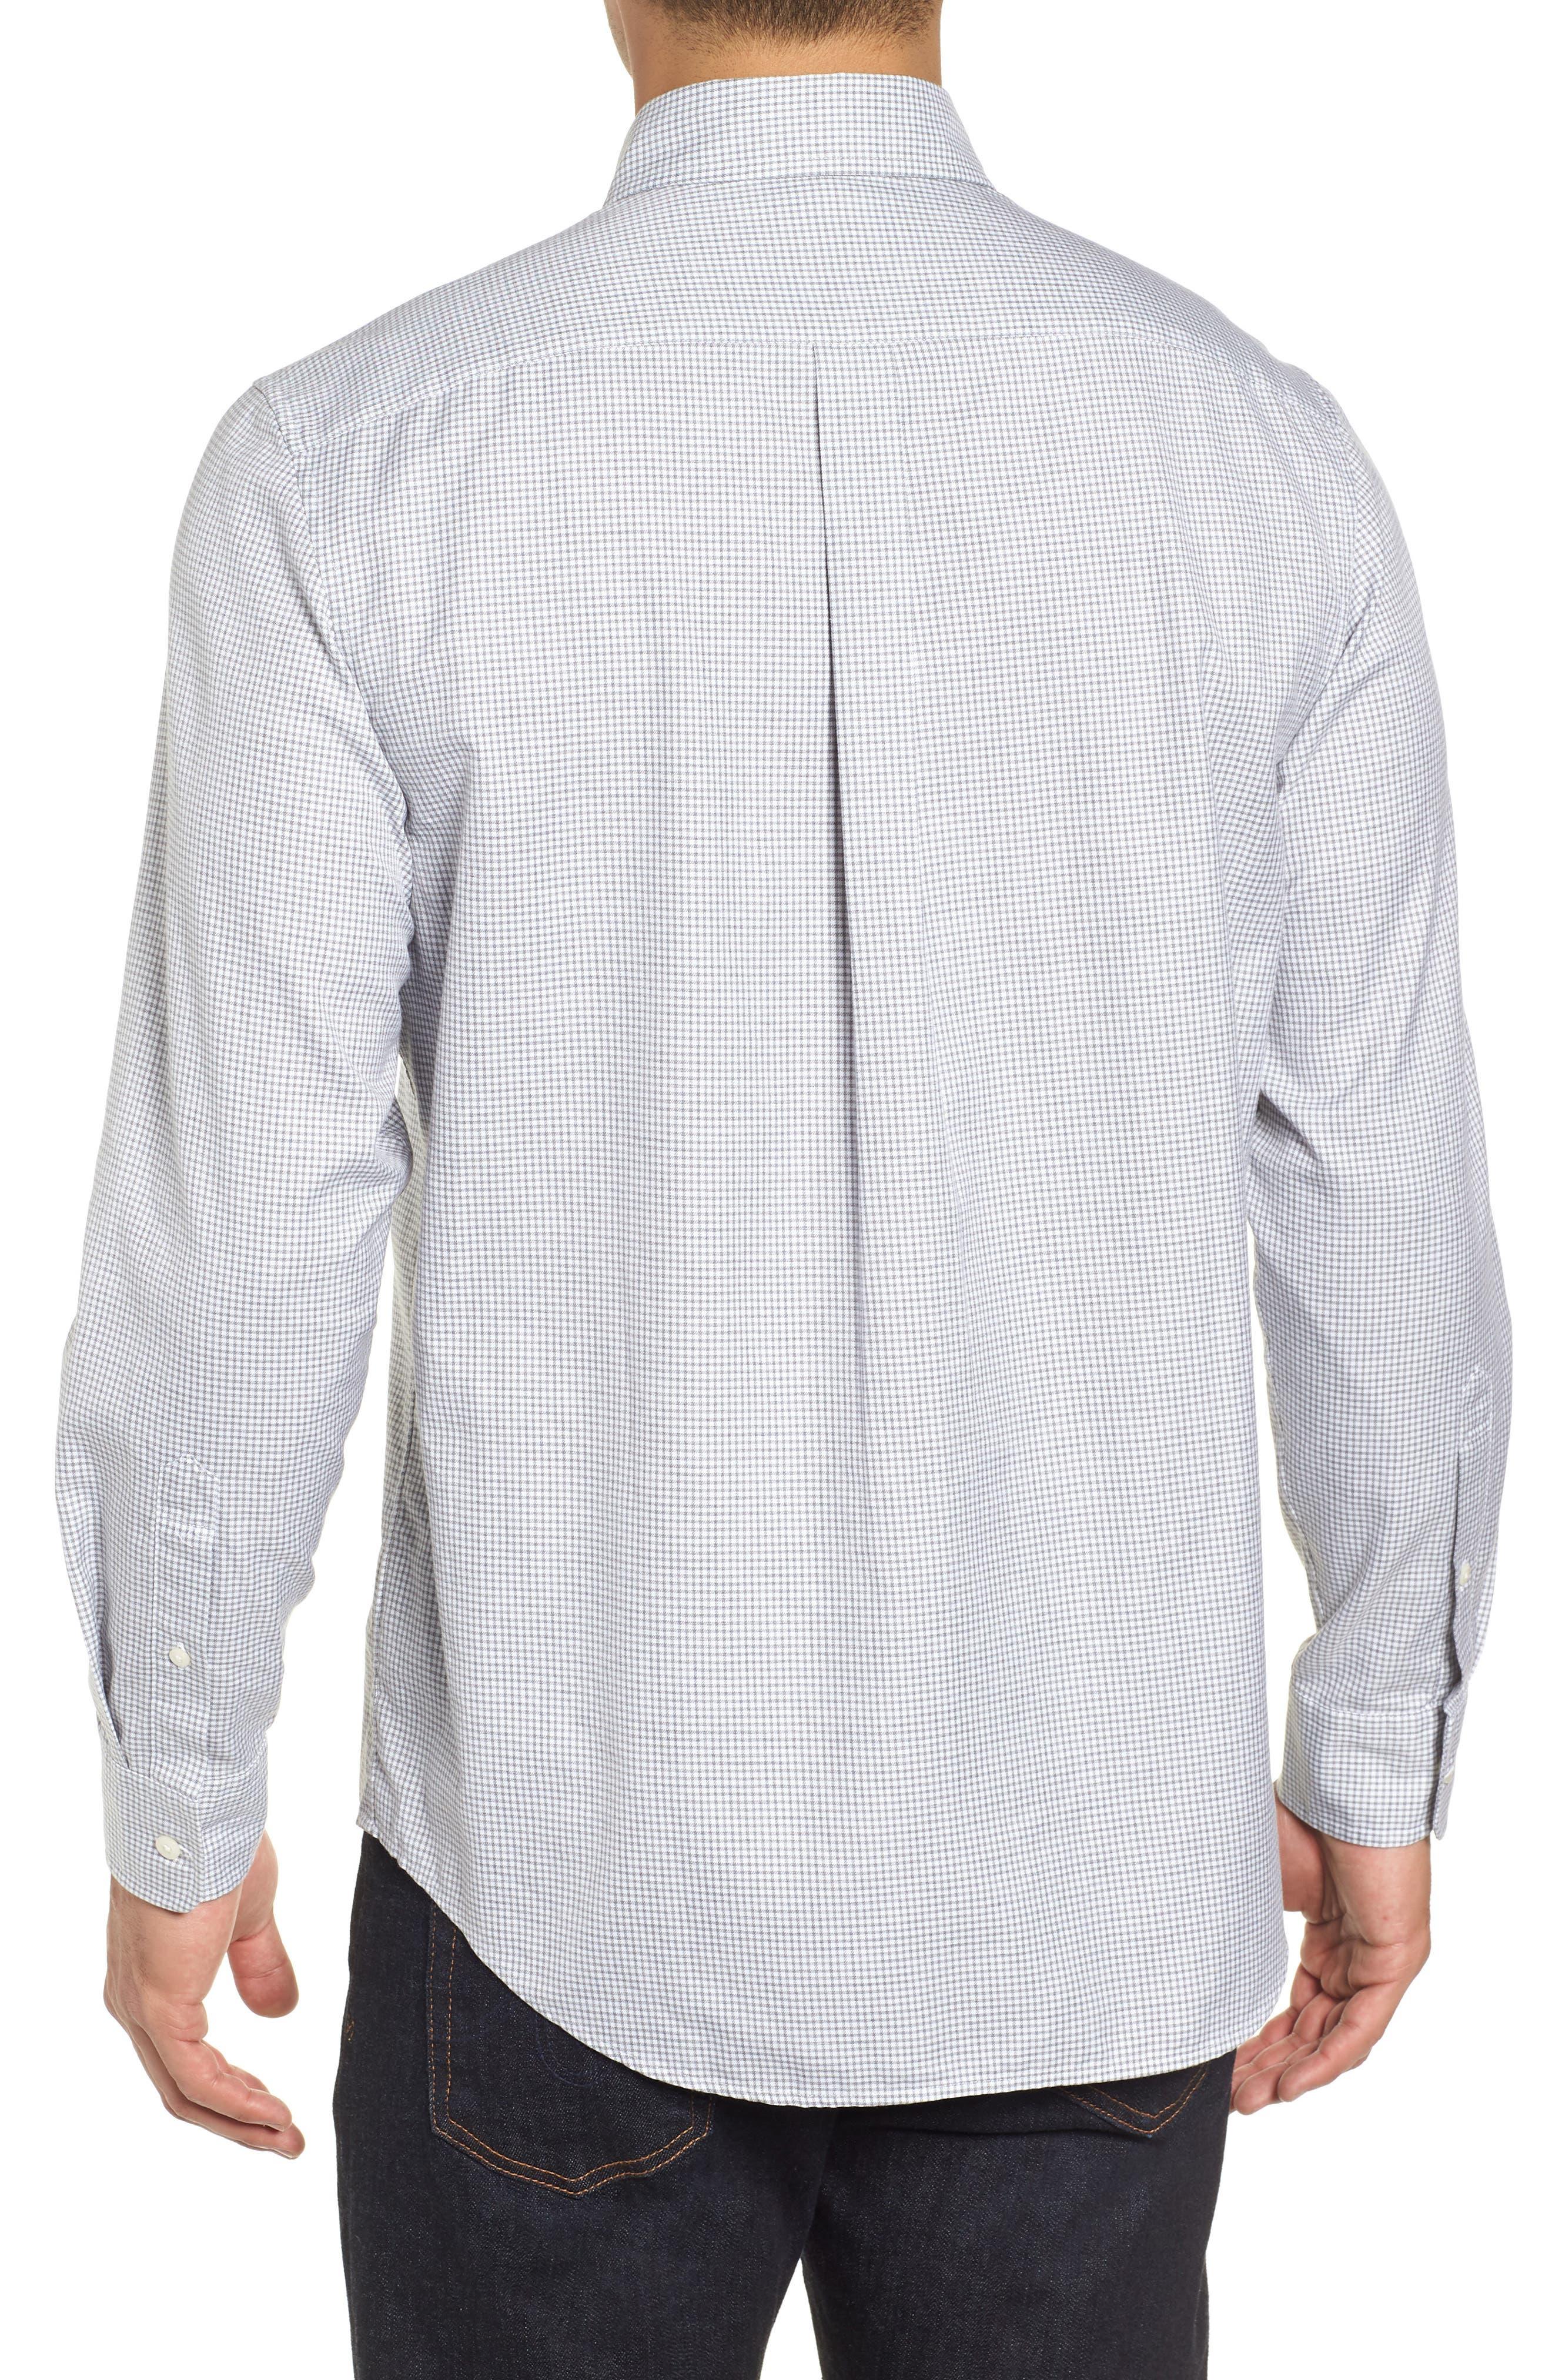 Kettle Cove Regular Fit Gingham Sport Shirt,                             Alternate thumbnail 3, color,                             BARRACUDA